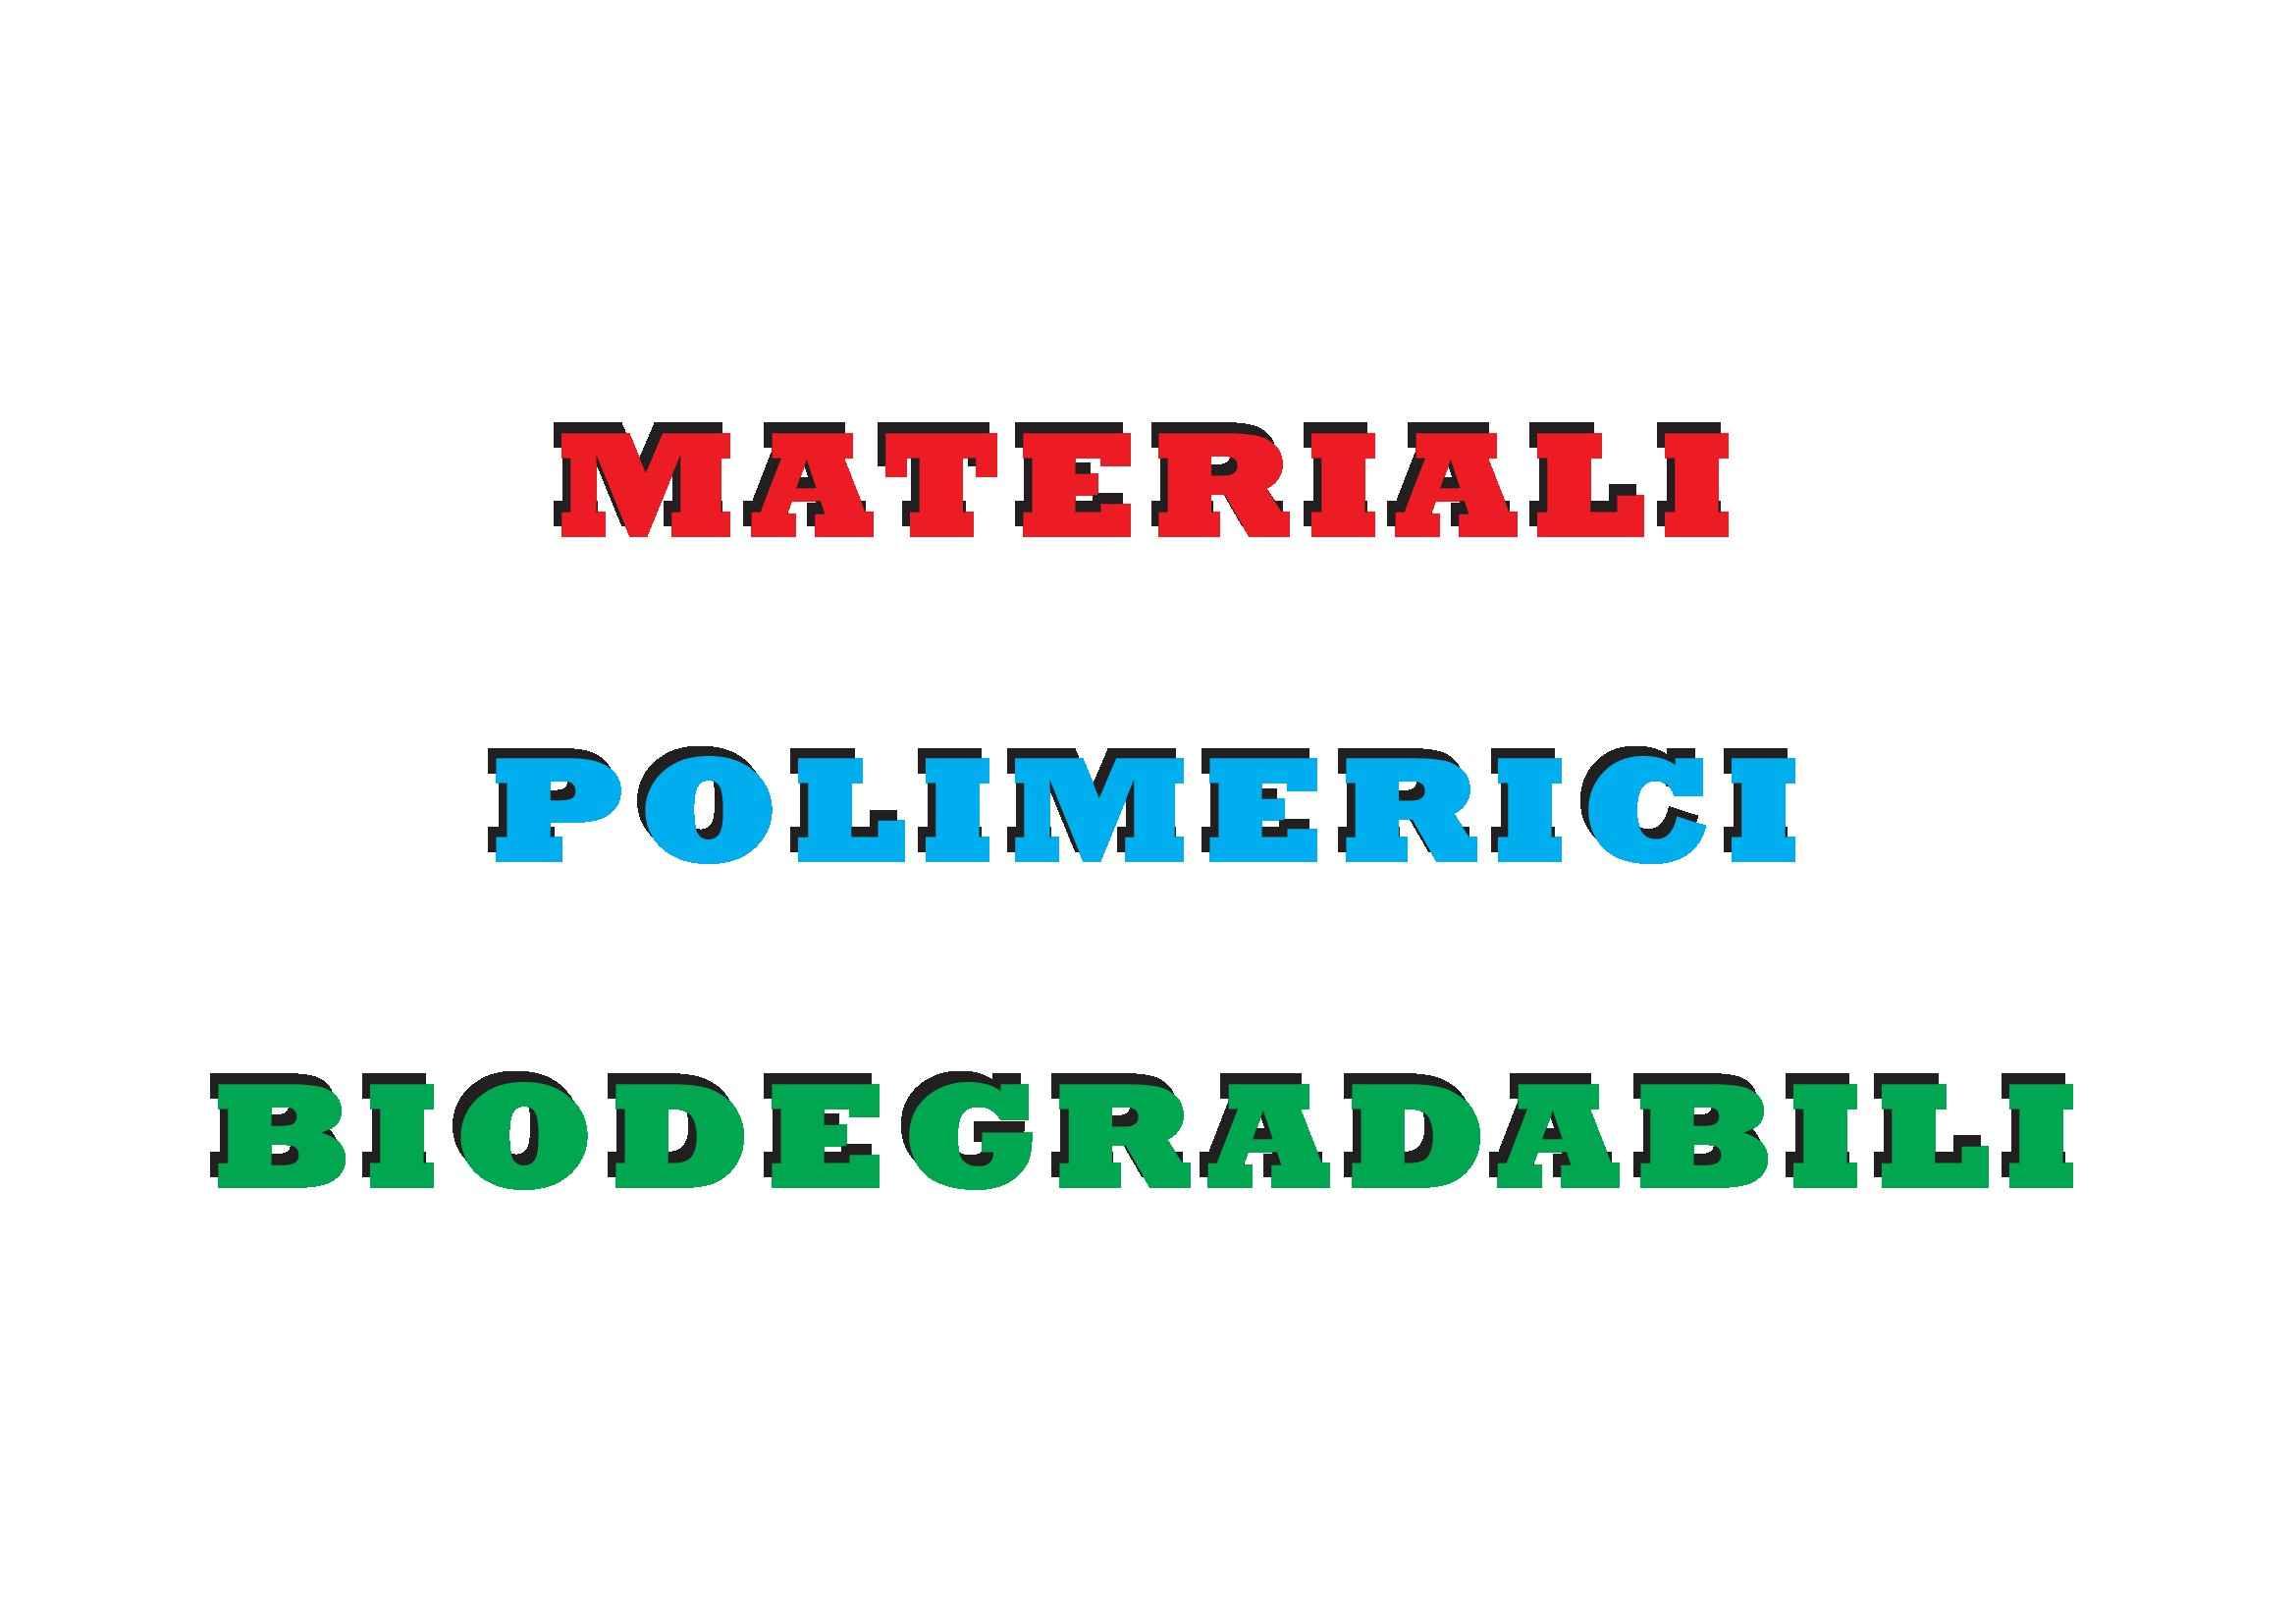 Materiali polimerici biodegradabili